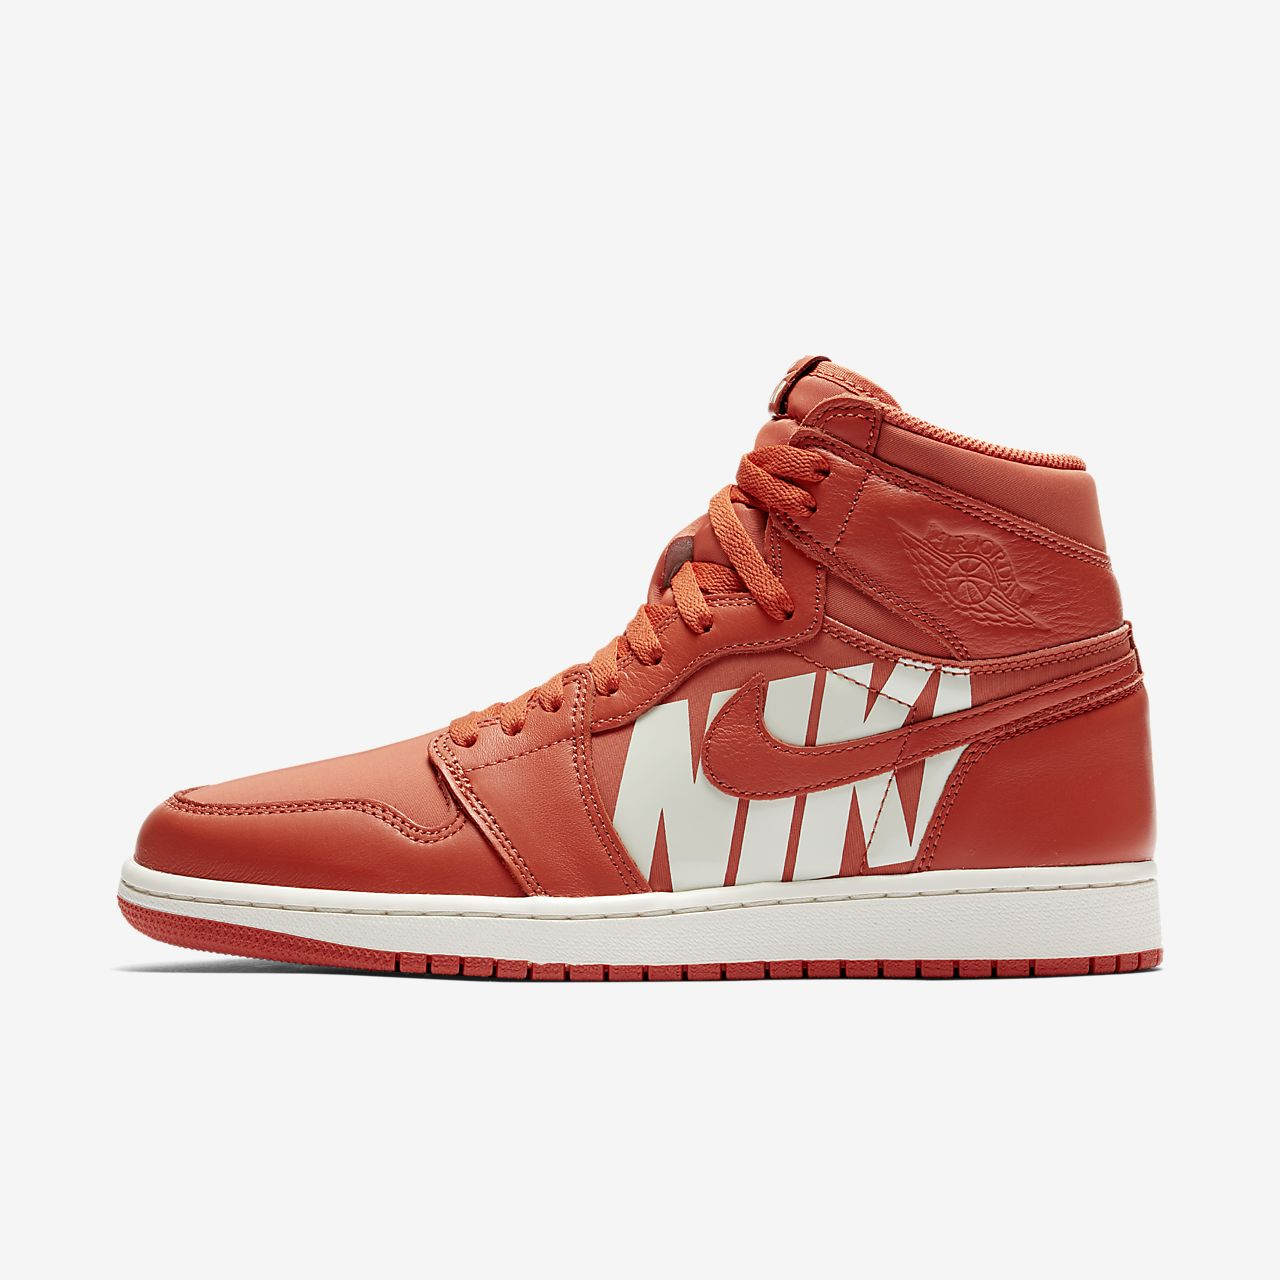 35e1e030cfdd6 Air Jordan 1 Retro High OG Zapatillas. Nike.com ES